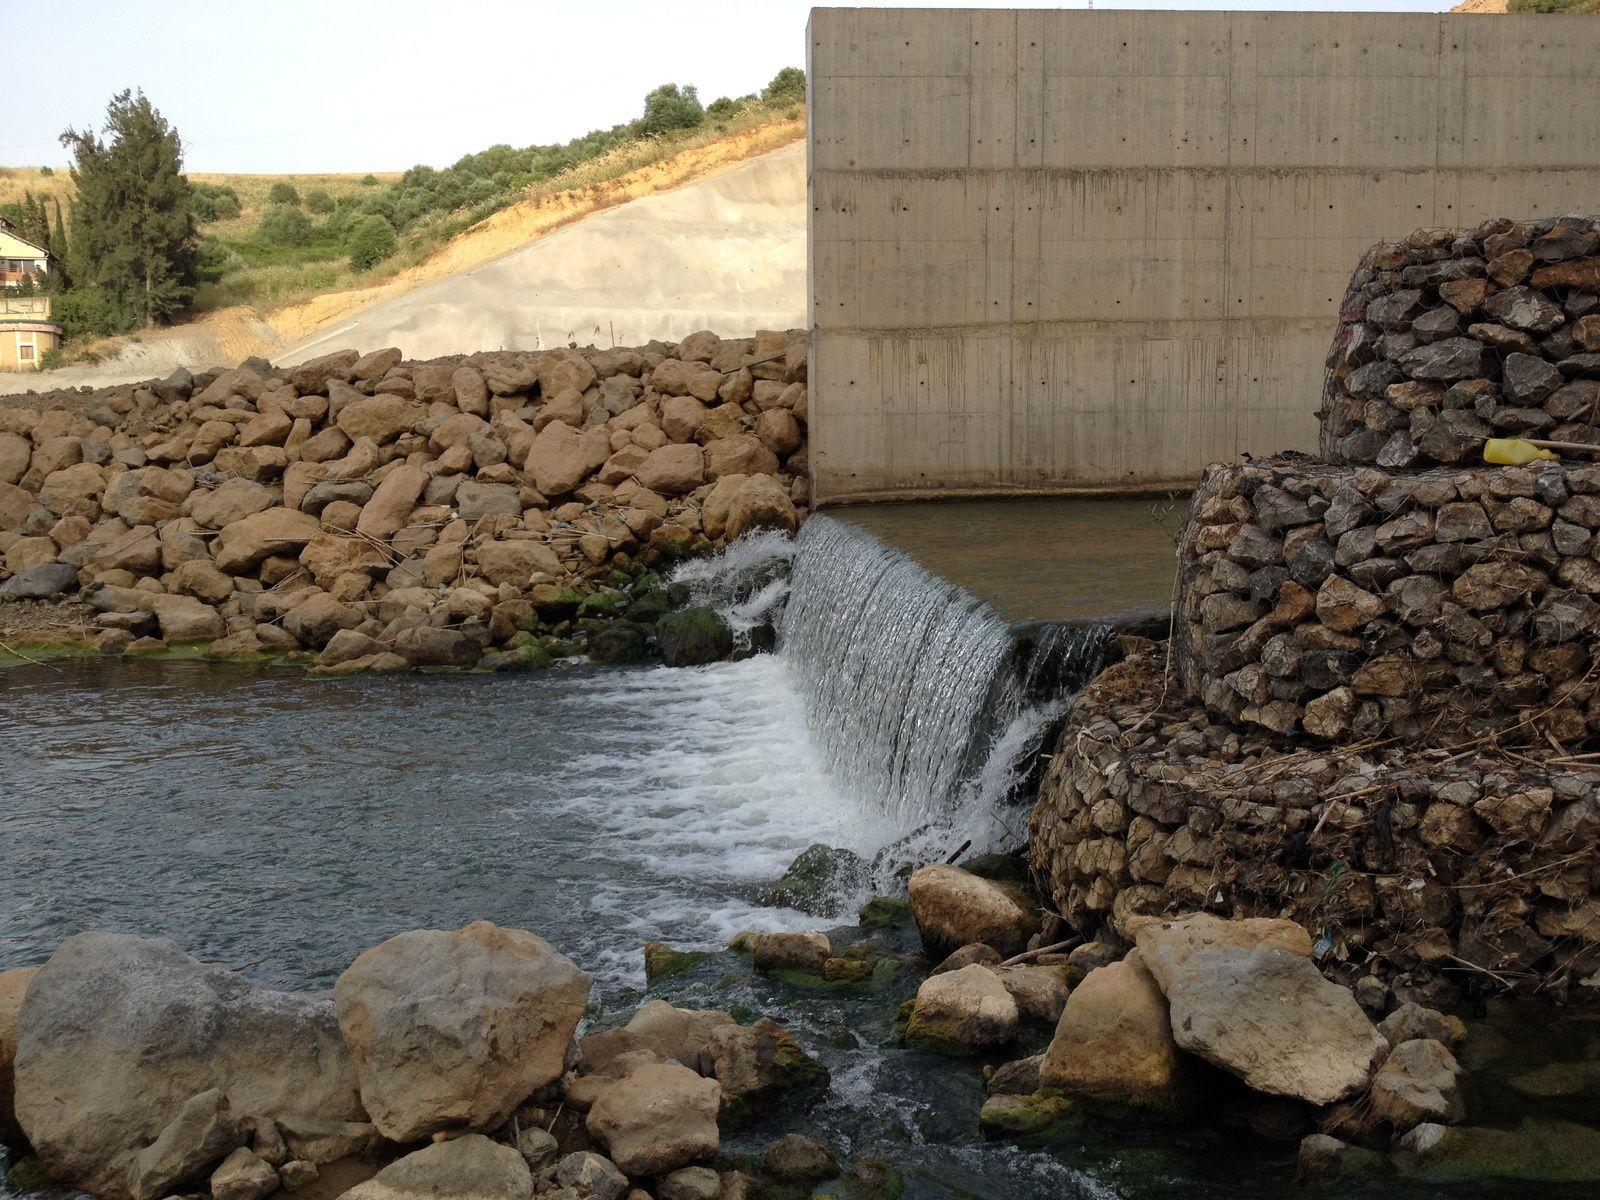 Le barrage hydraulique de Souk n'Tleta